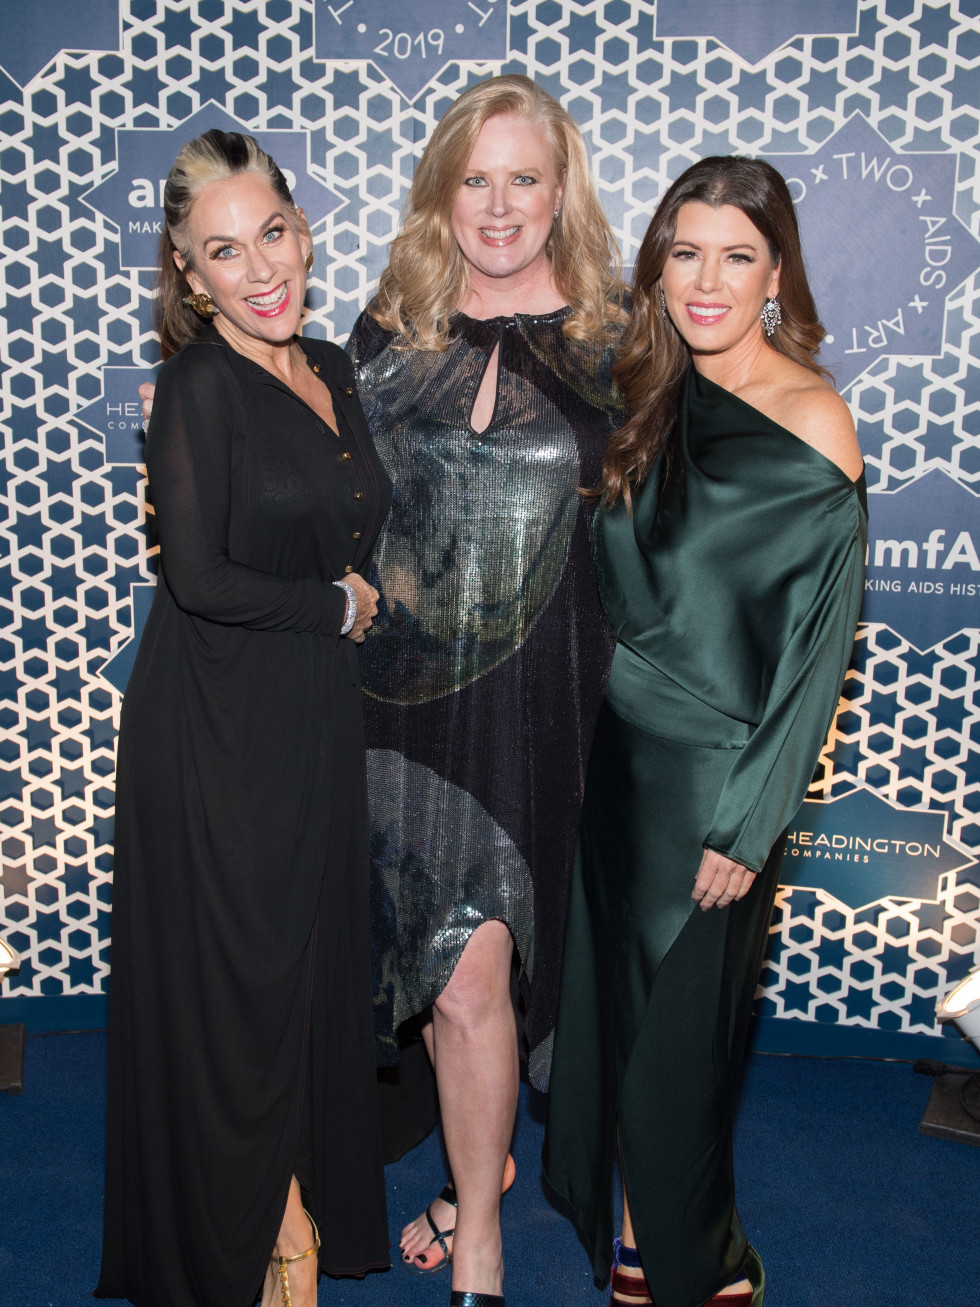 Lucy Wrubel, Suzanne Droese, Brooke Hortenstine